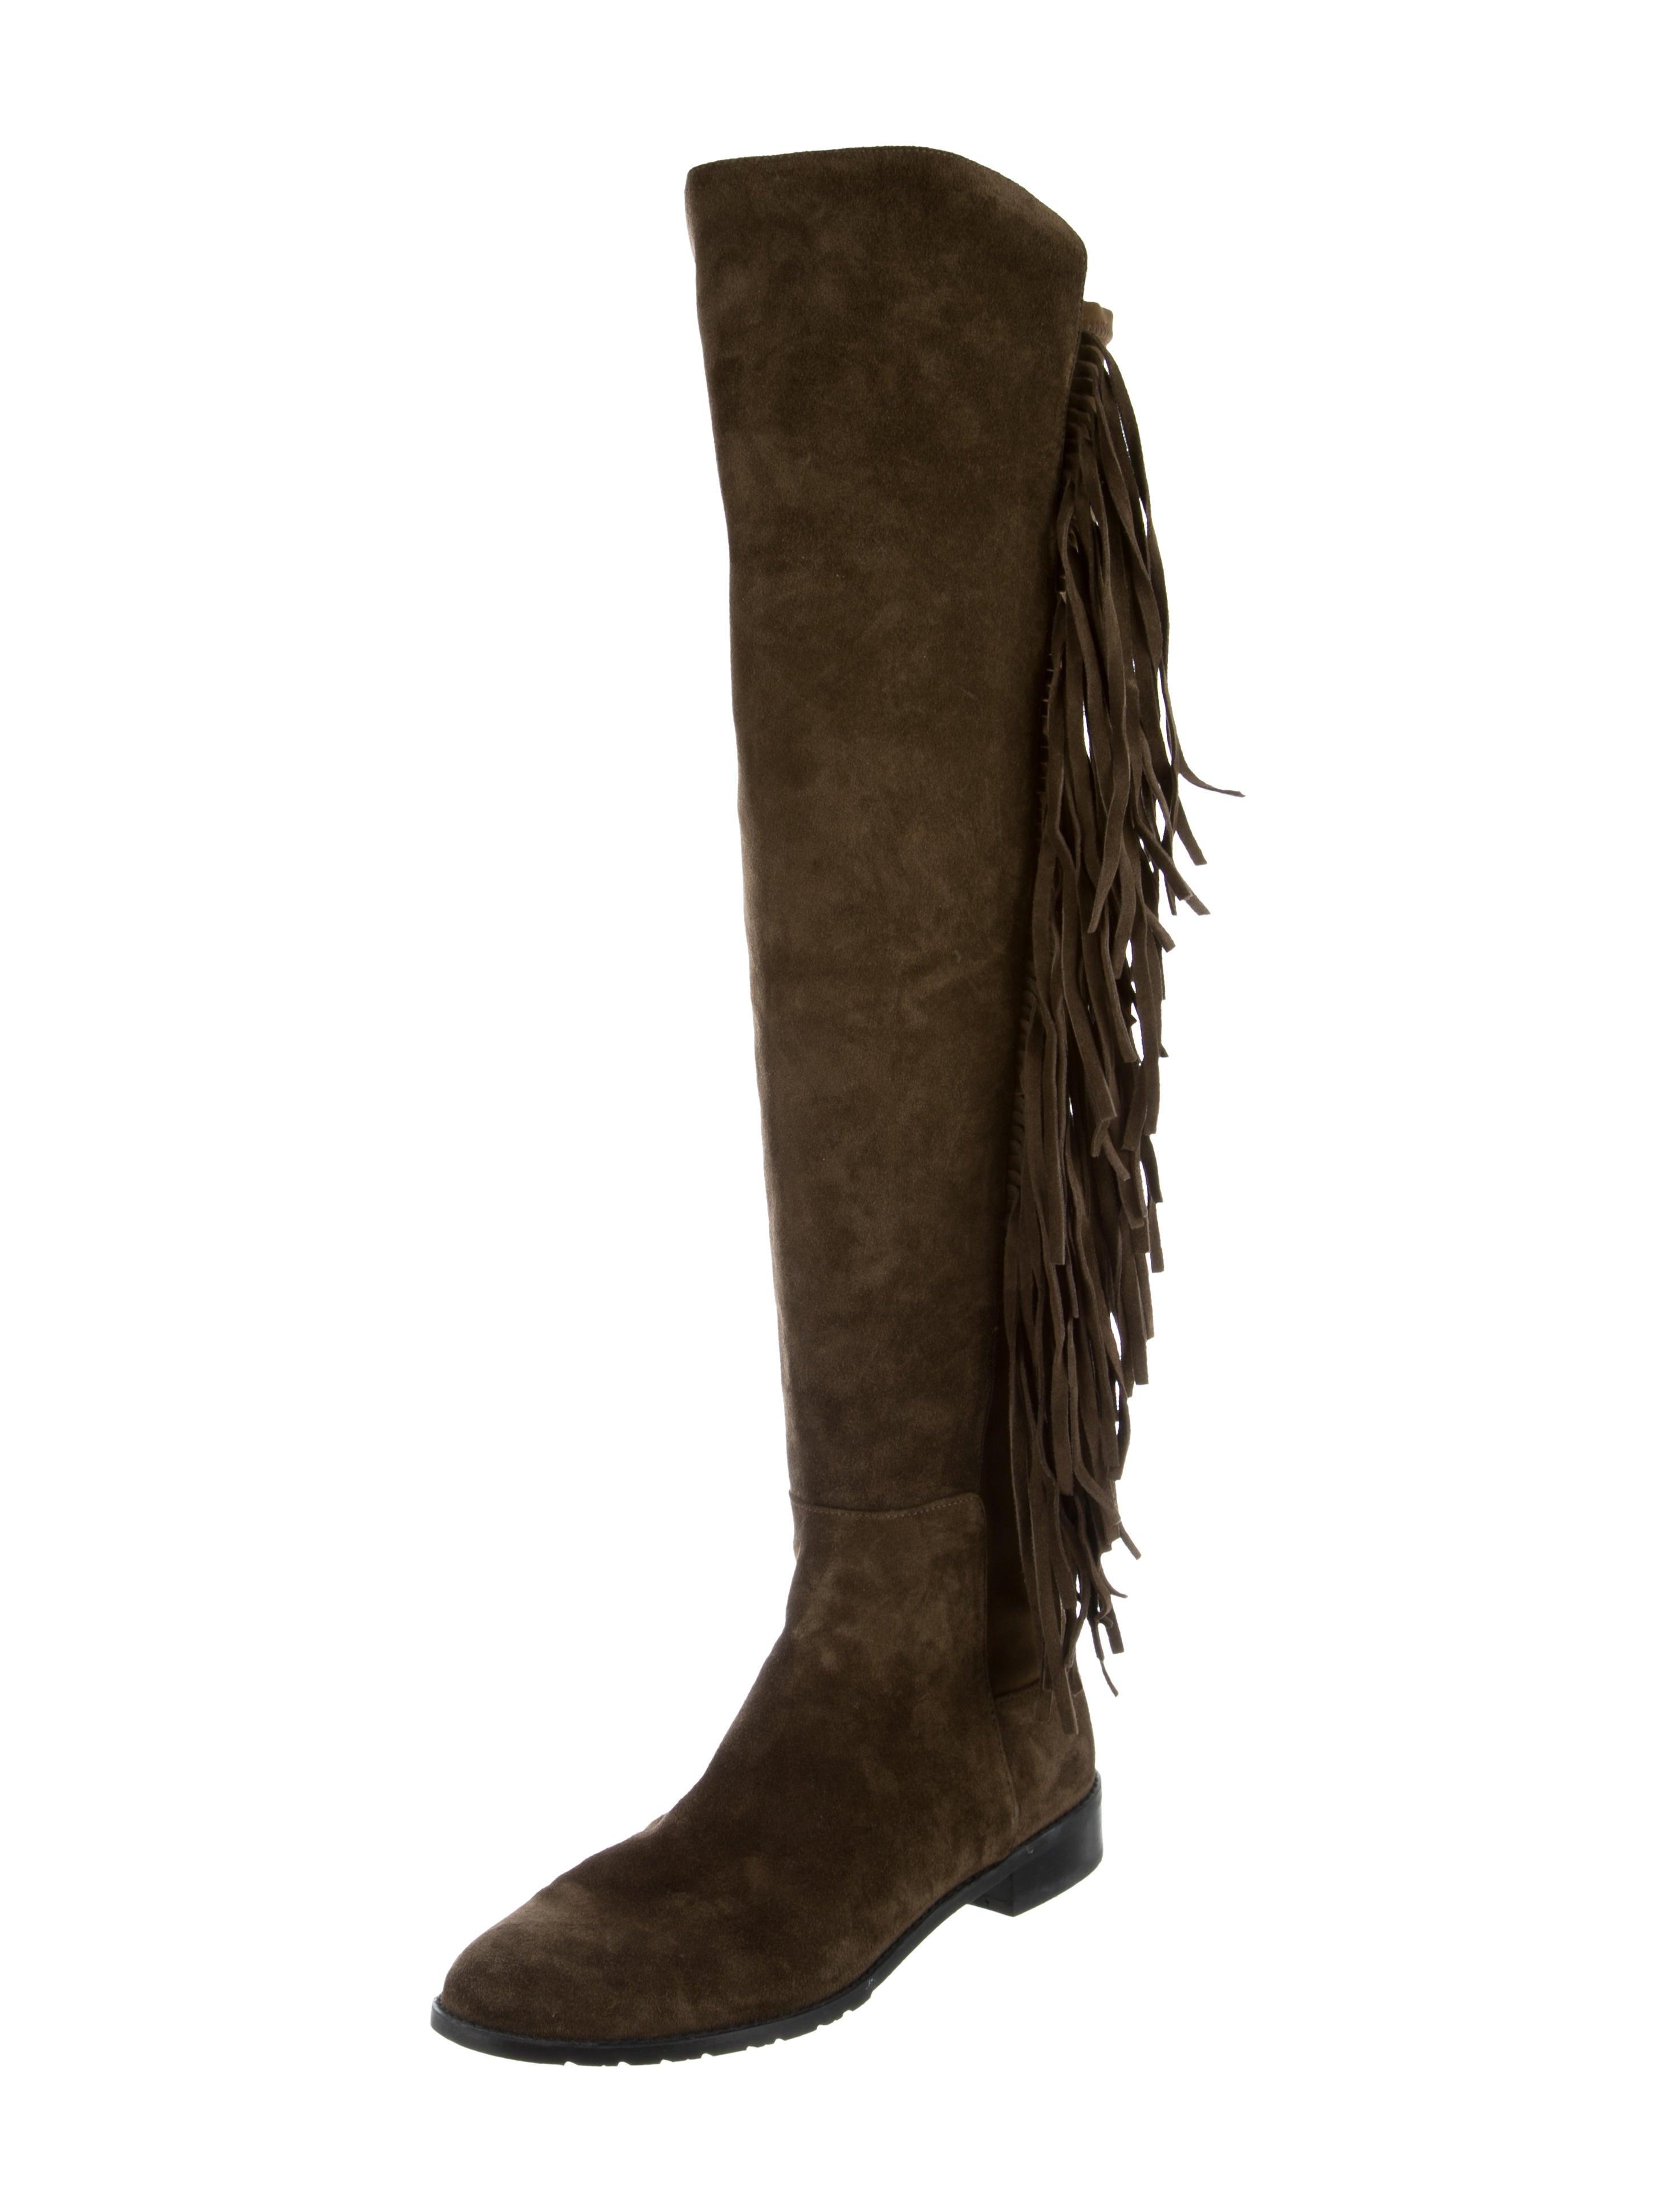 Stuart Weitzman ChicBoot Fringe Boots 2014 new cheap online low cost for sale cheap best seller sale footlocker finishline for sale online store 5dk04Rq